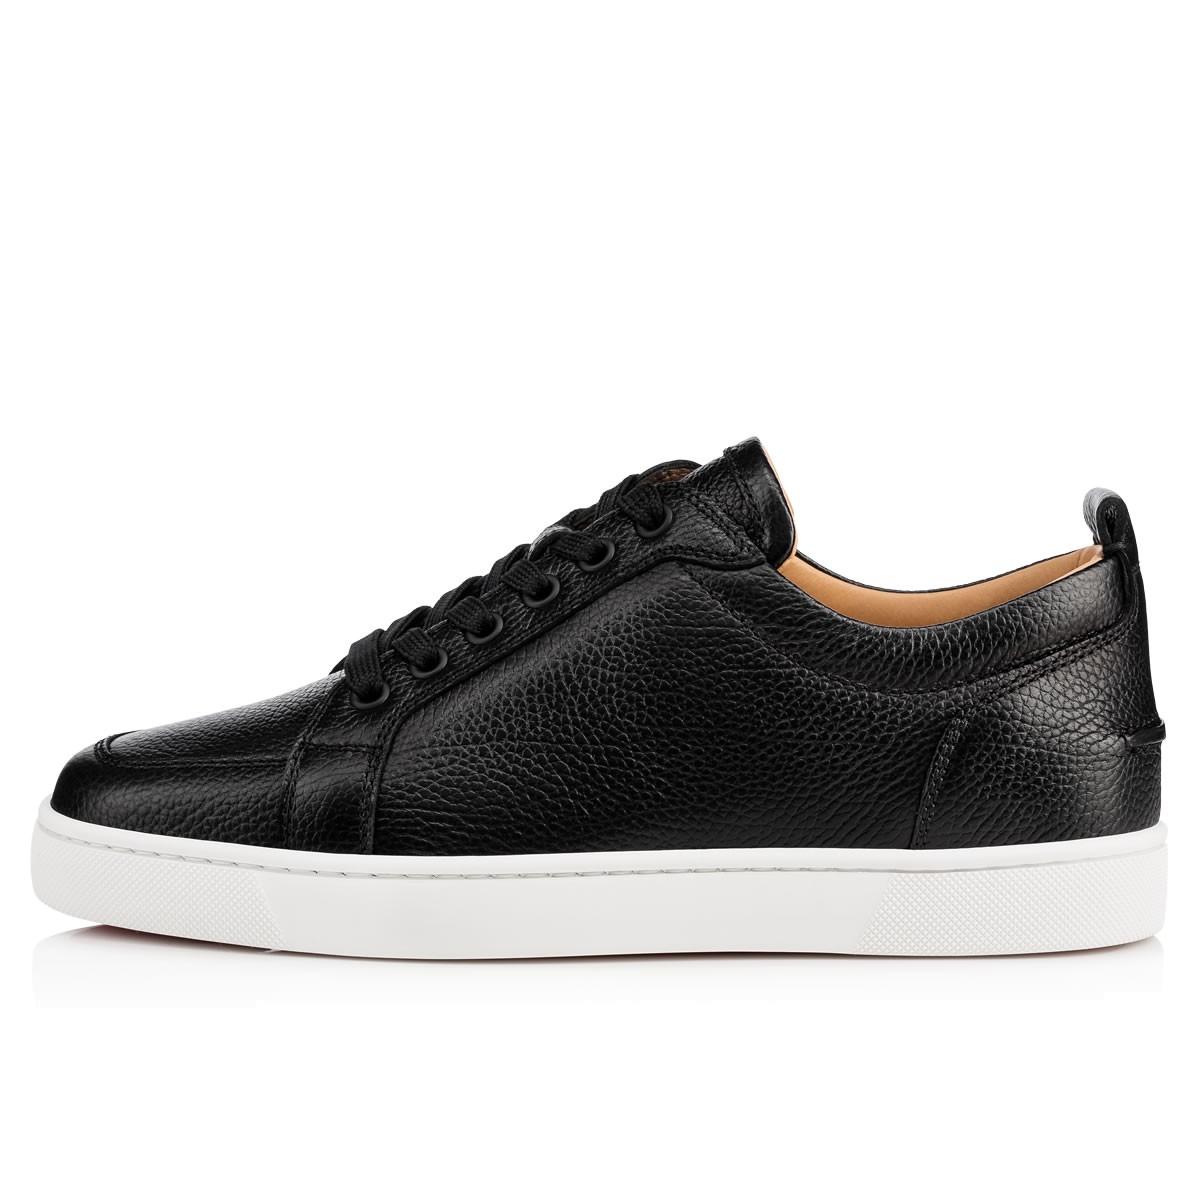 RANTULOW BLACK CALF - Men Shoes